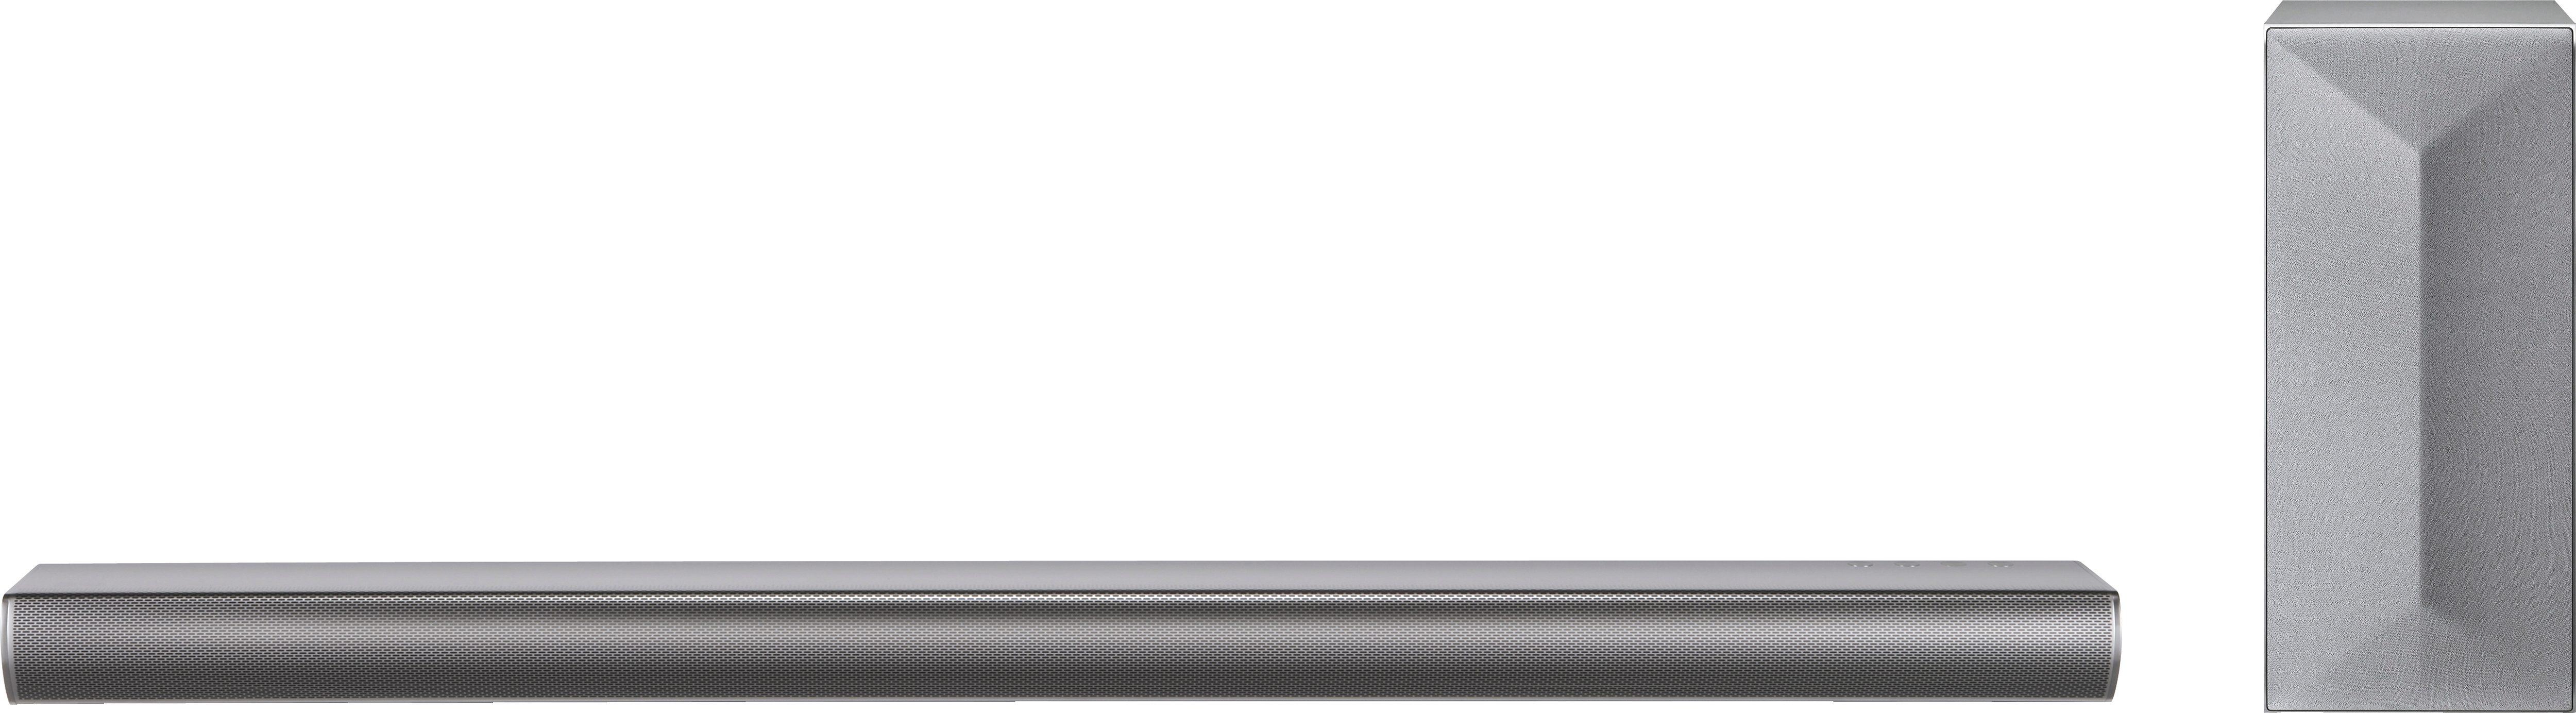 LG LAC650H Soundbar